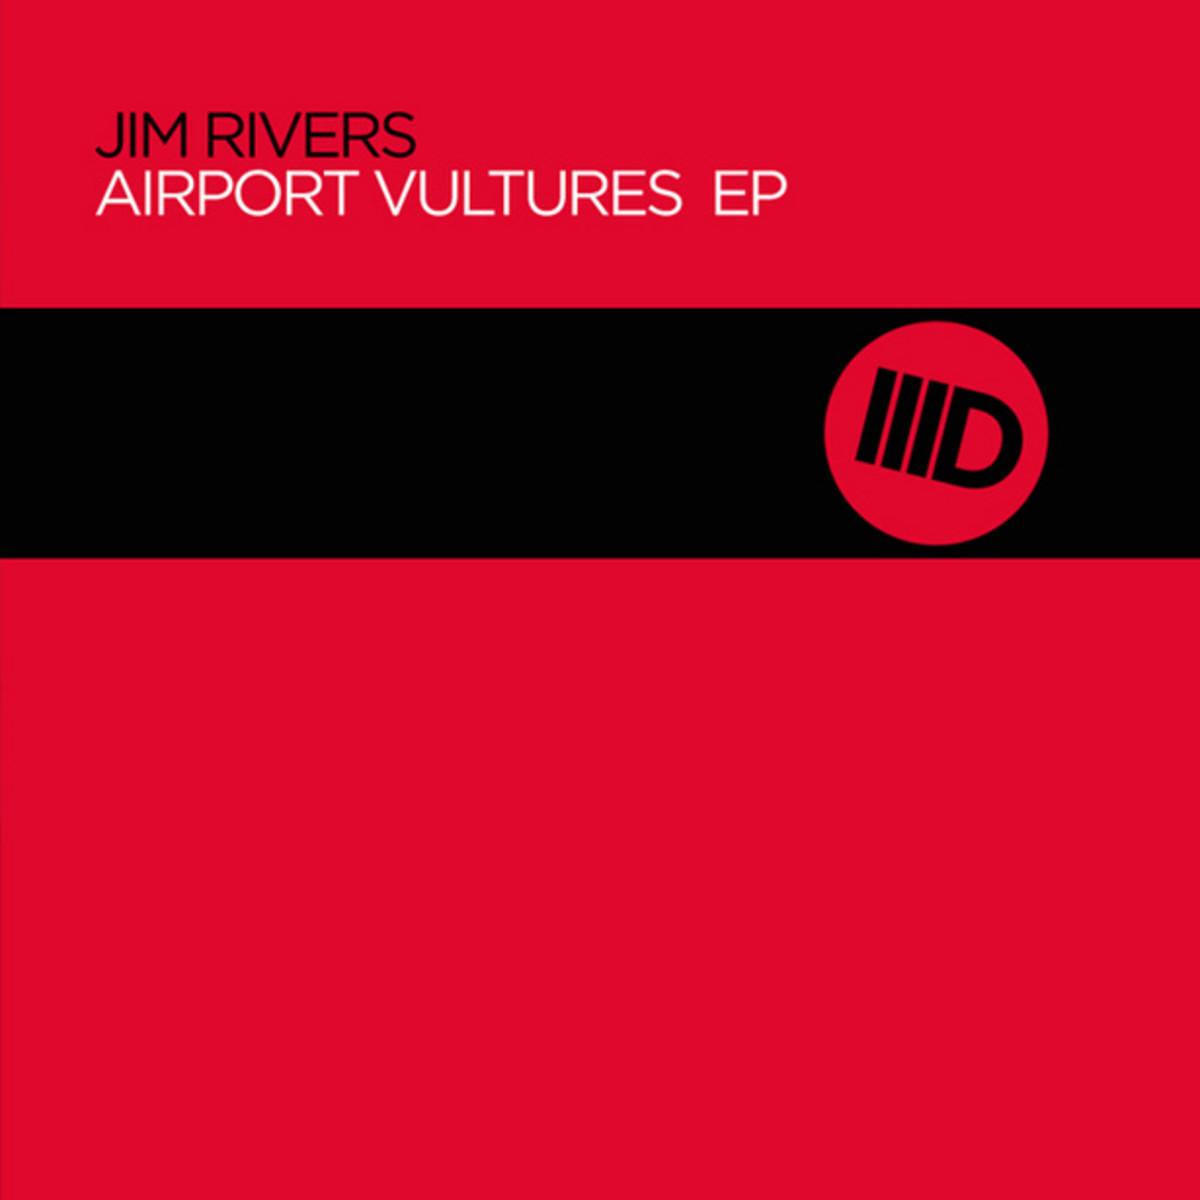 jim-rivers